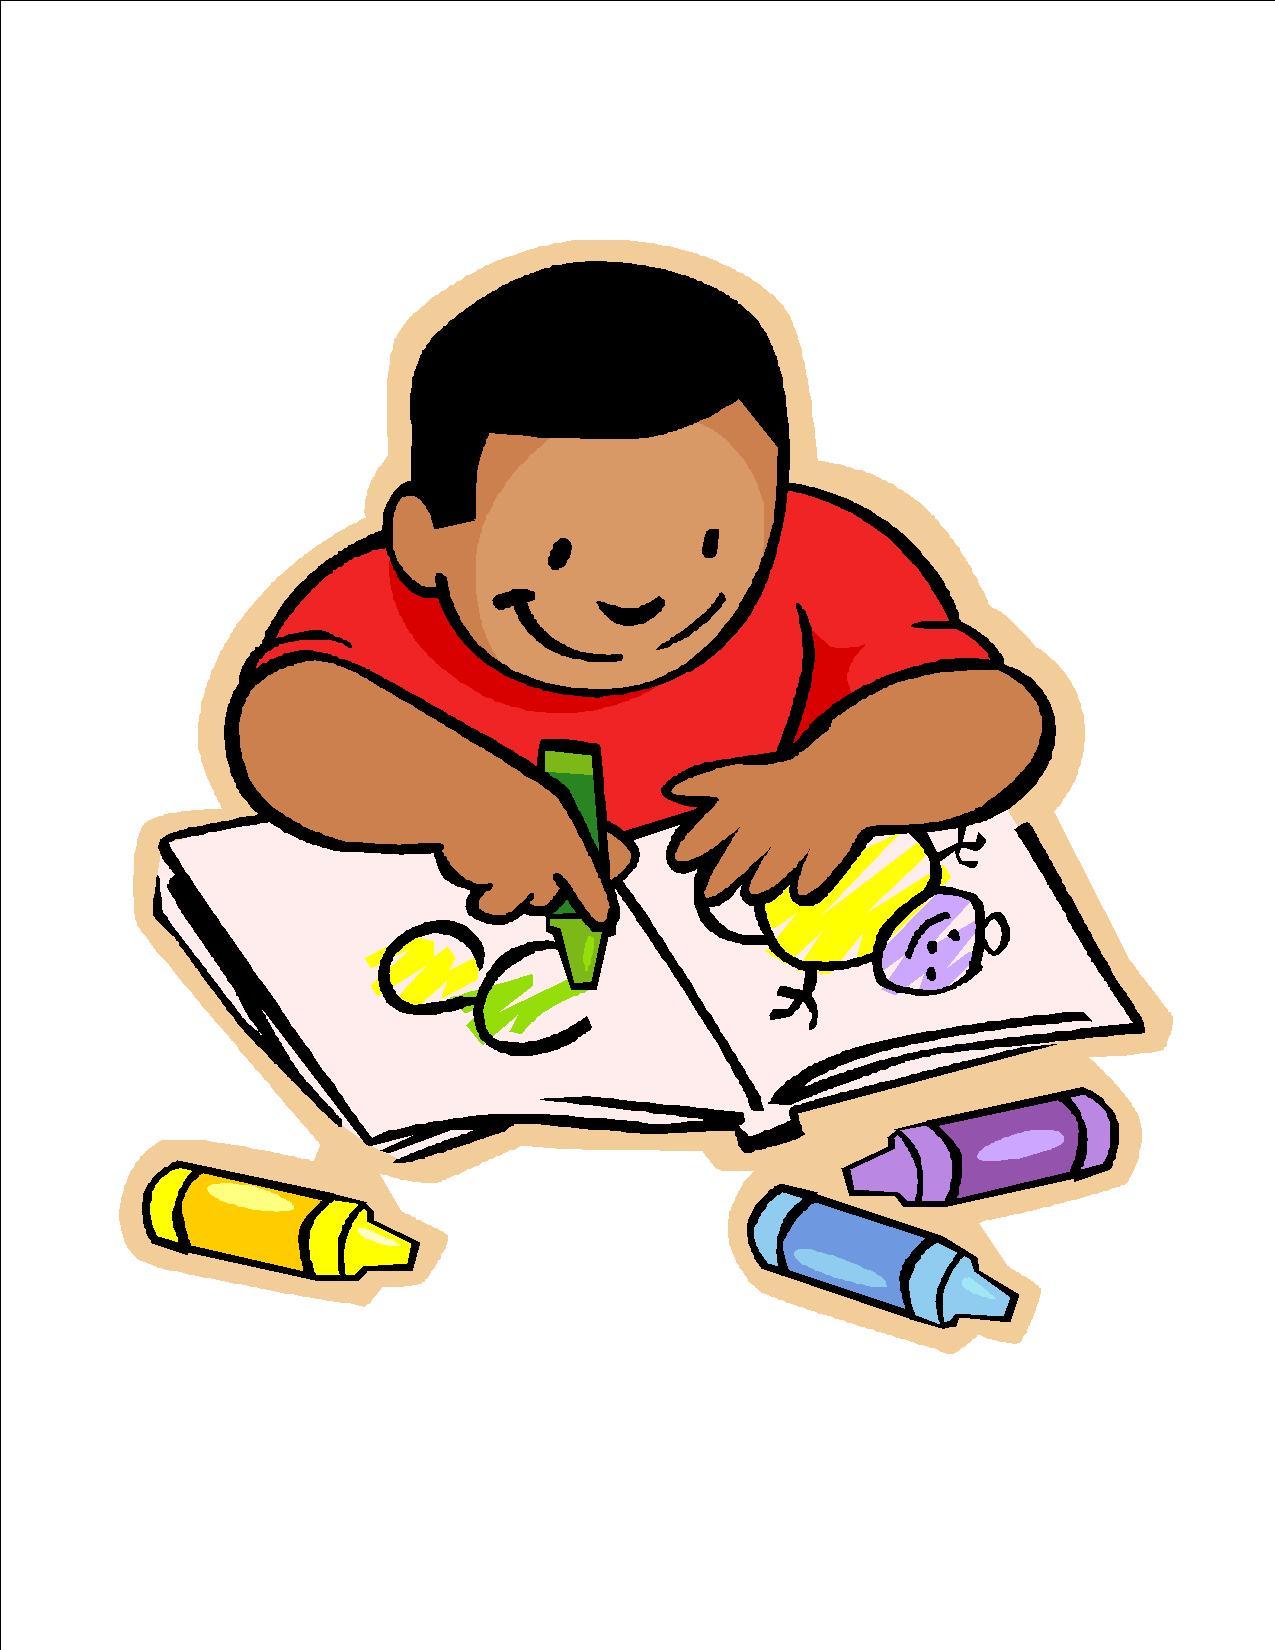 1275x1650 Homework Clip Art For Kids Free Clipart Images 6 4